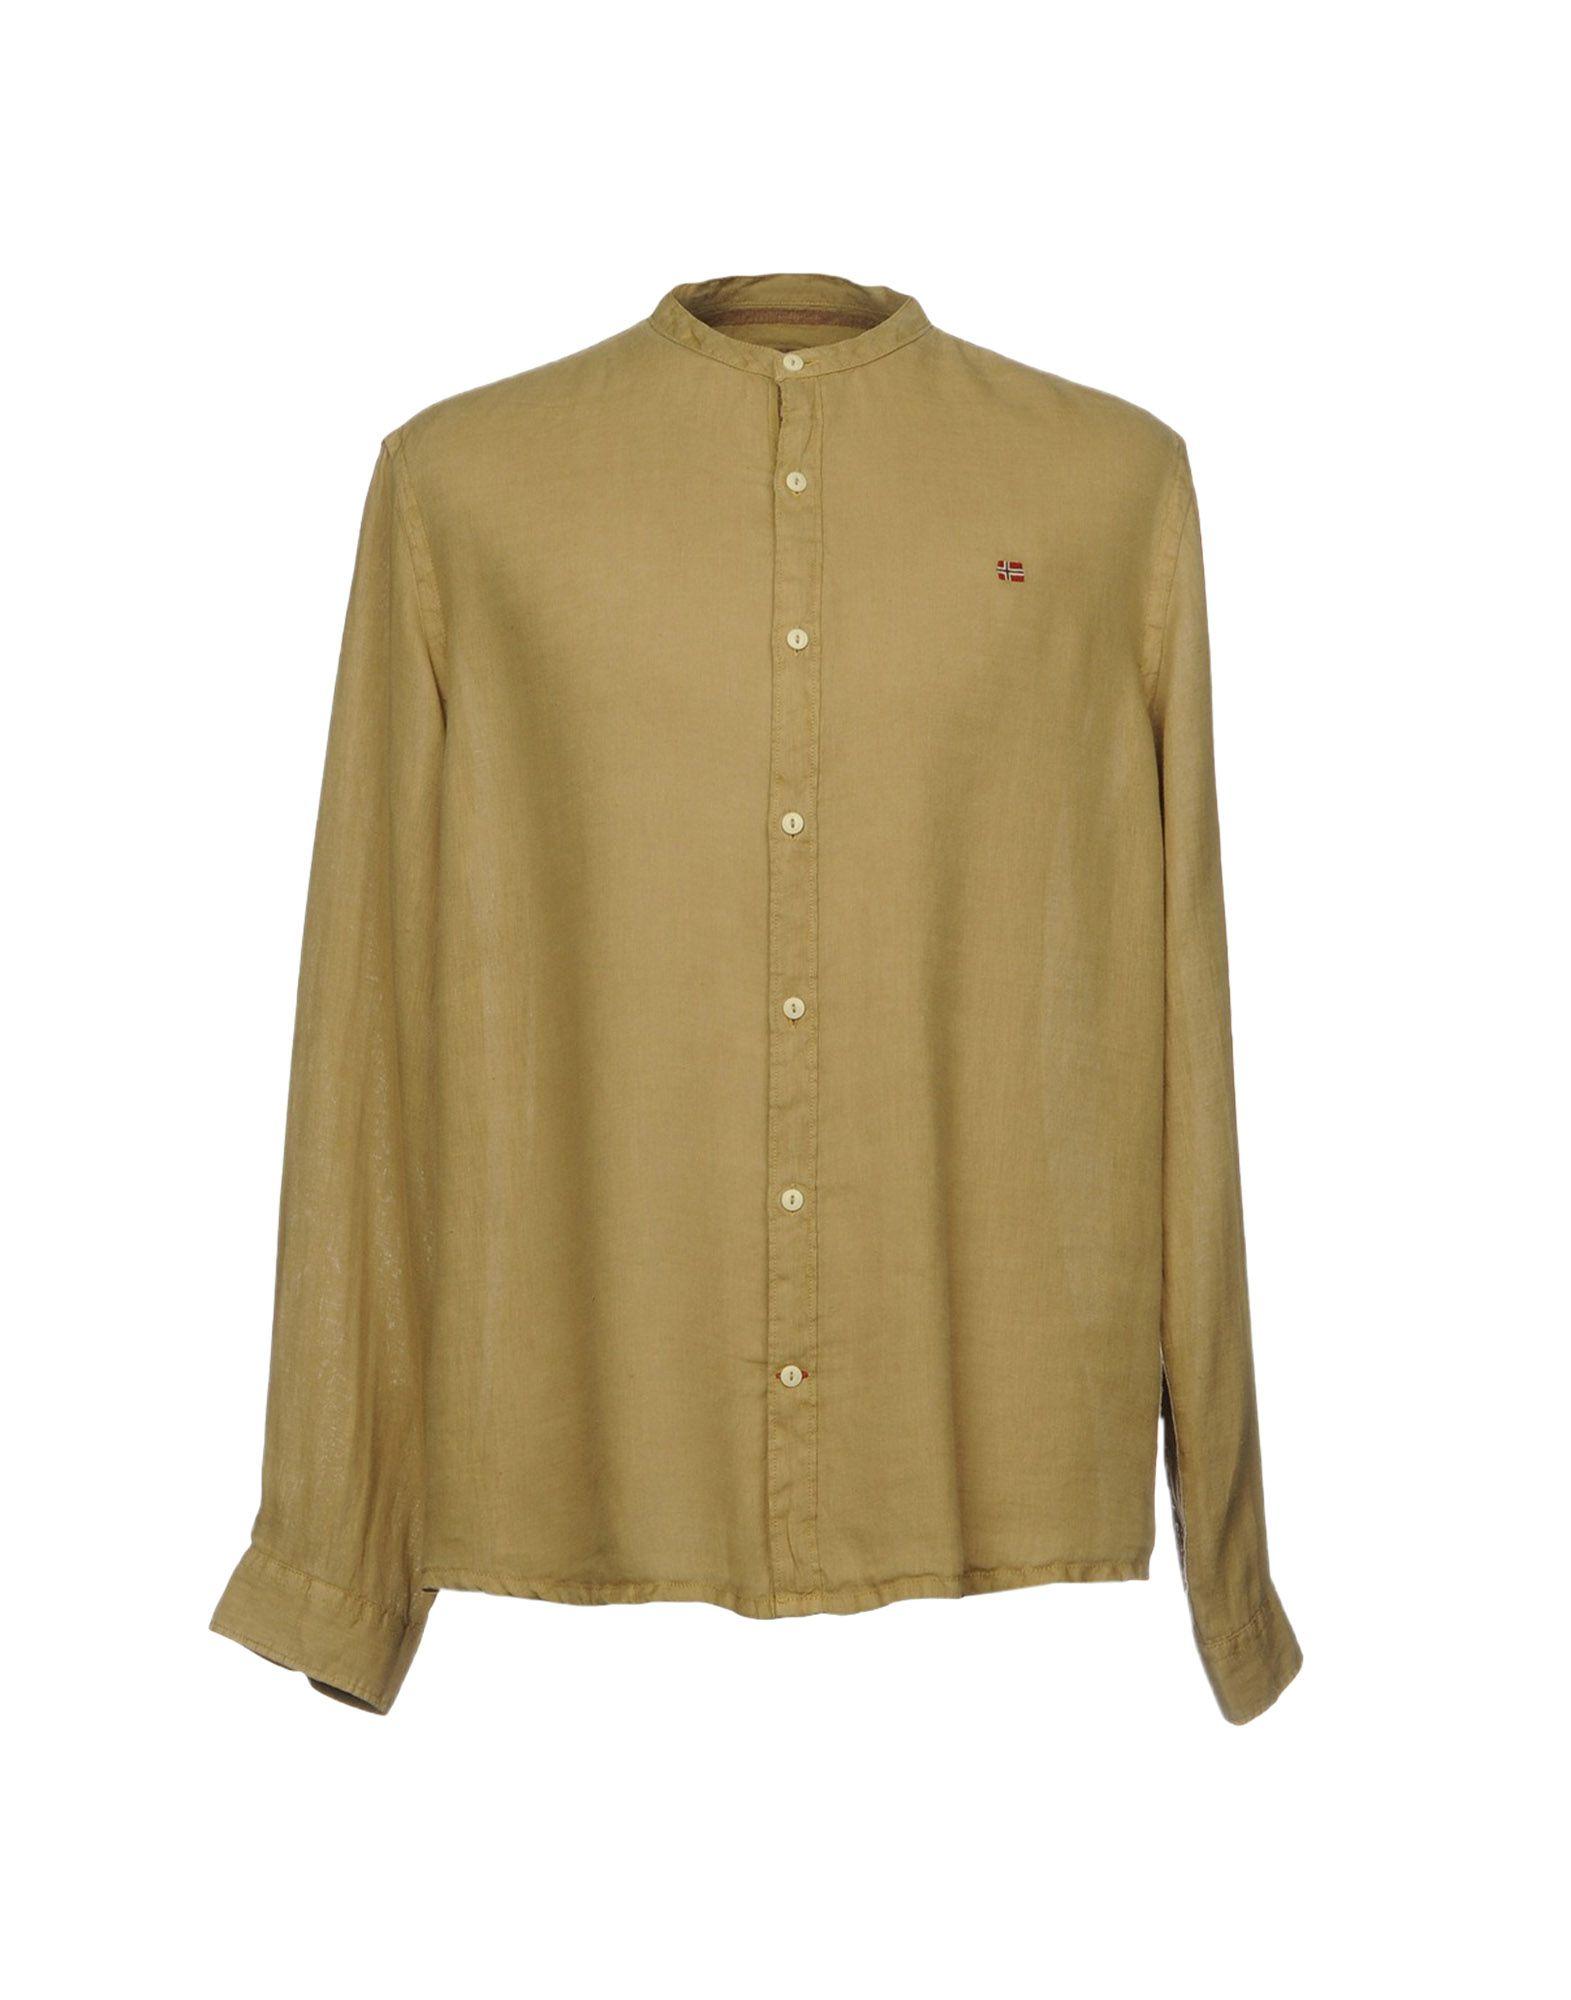 NAPAPIJRI Herren Hemd Farbe Khaki Größe 8 jetztbilligerkaufen